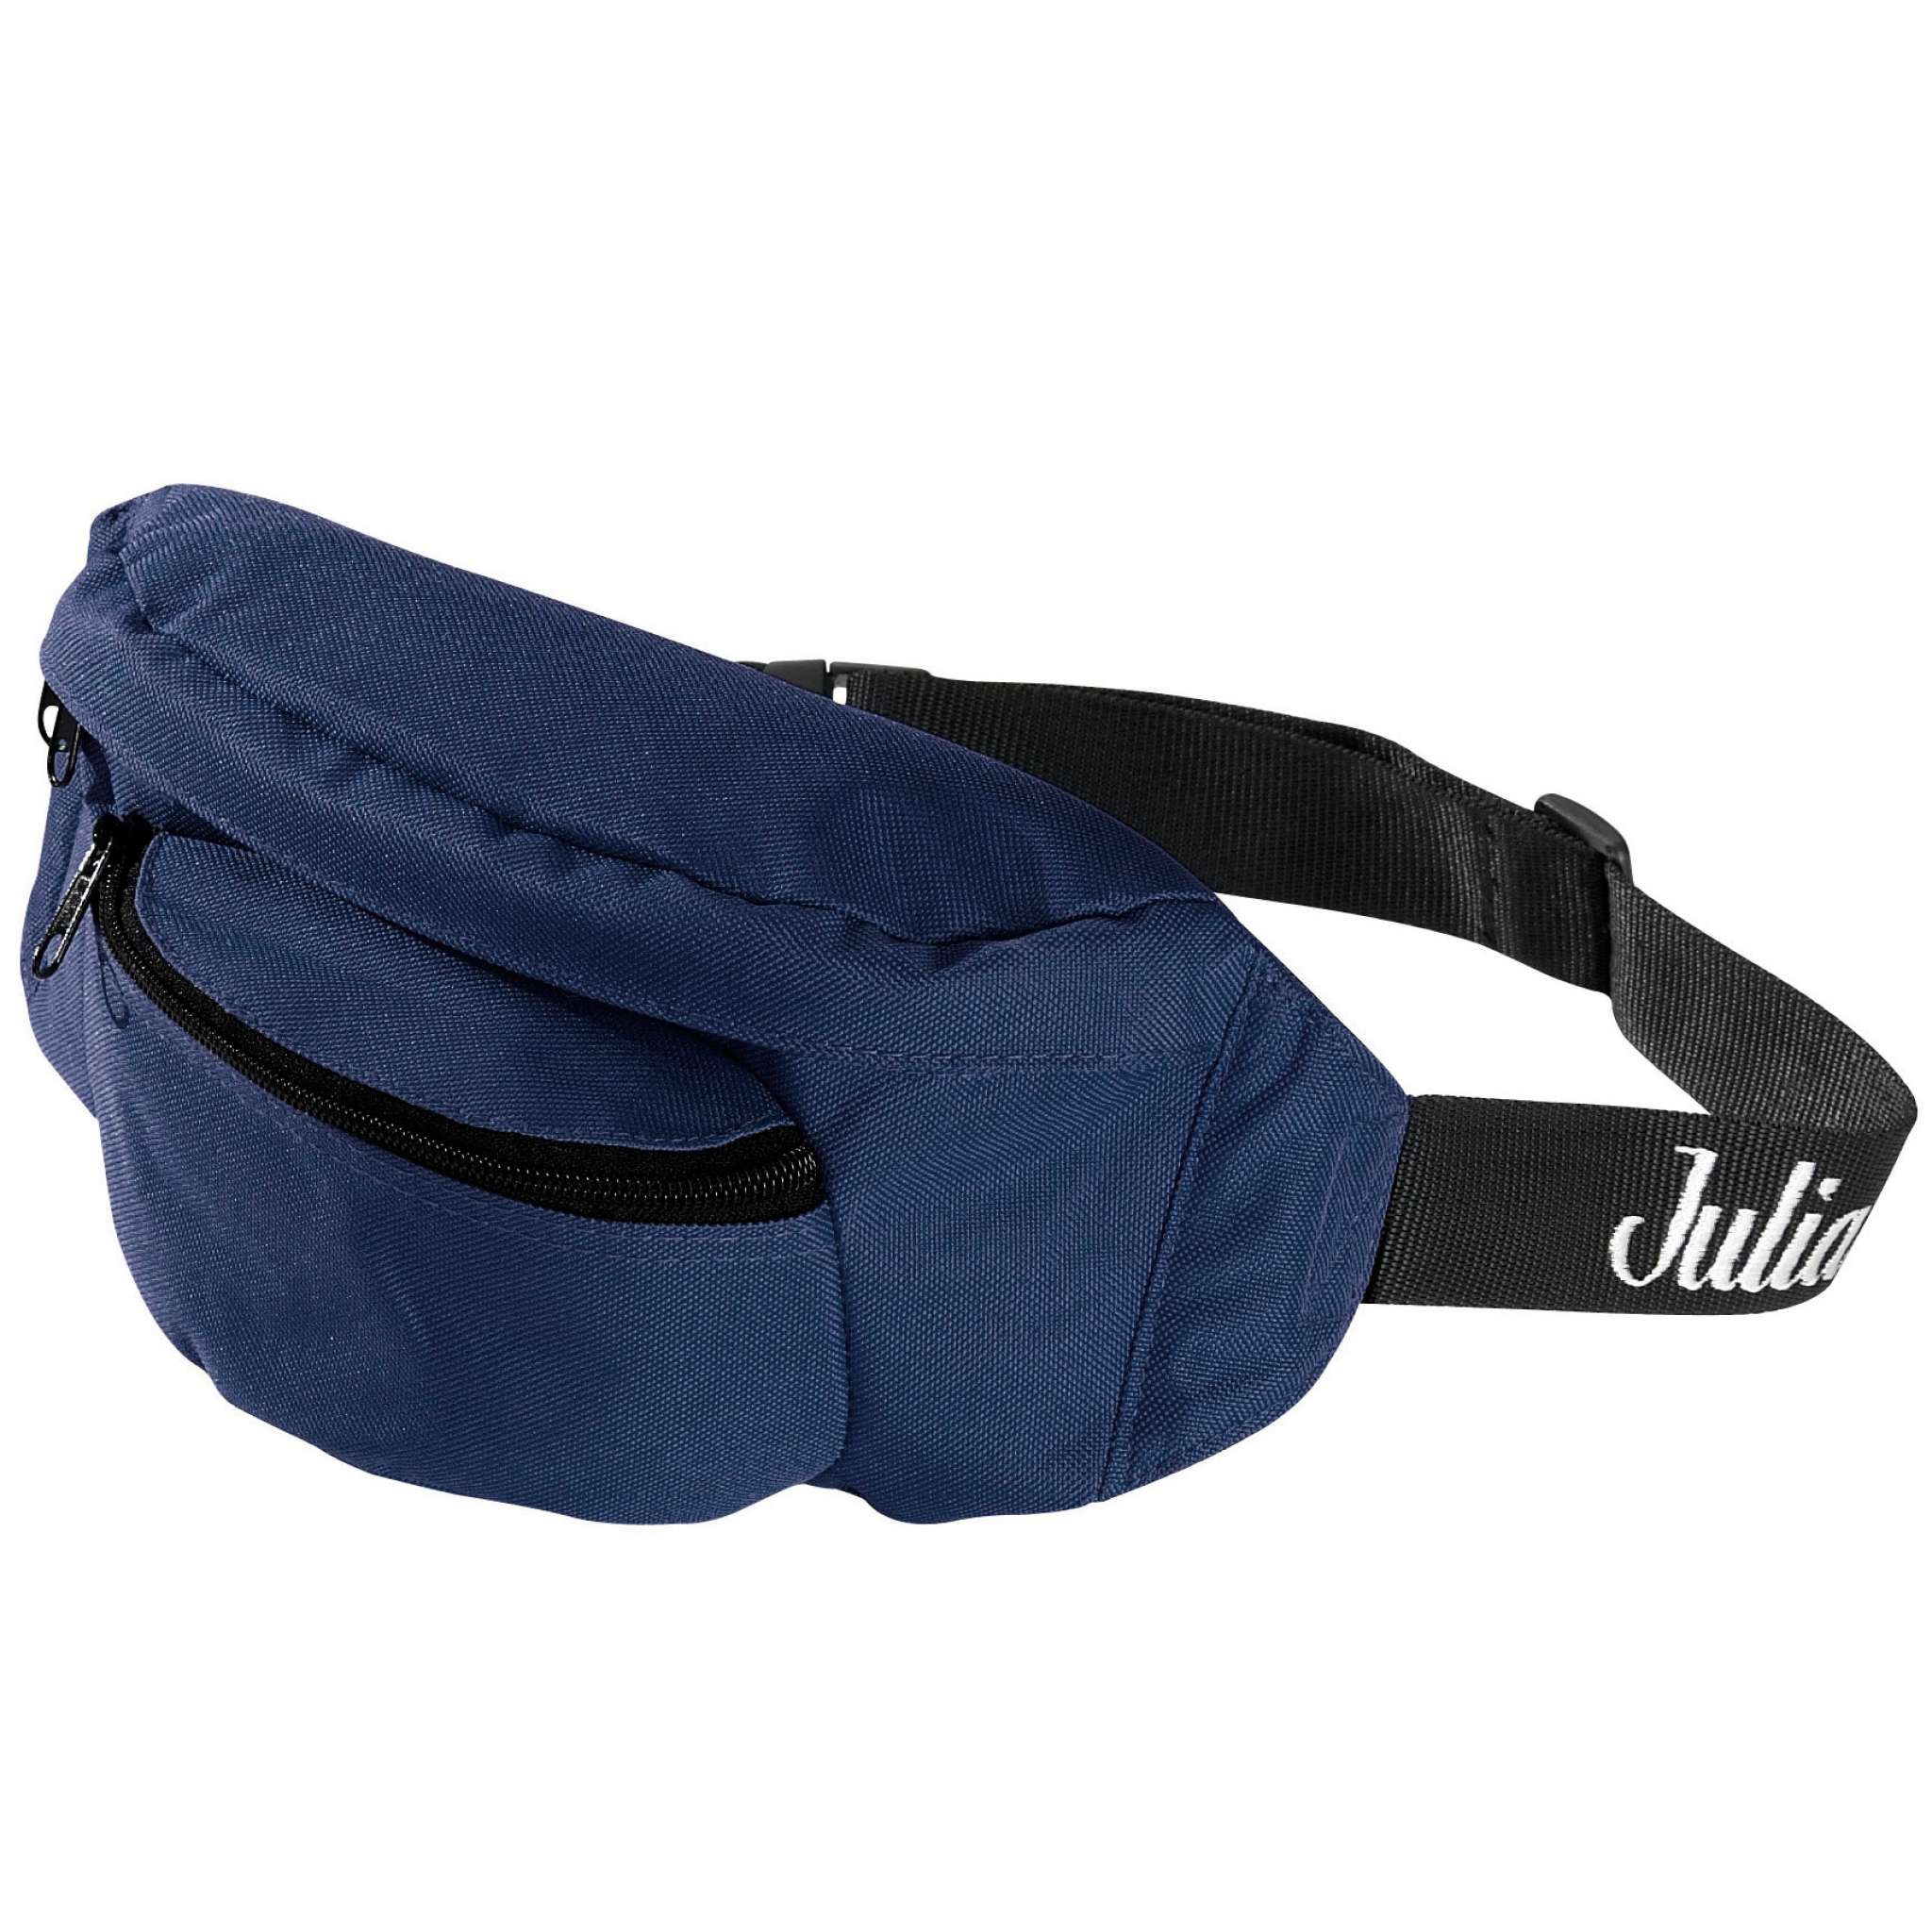 Superbonus: Hüfttasche